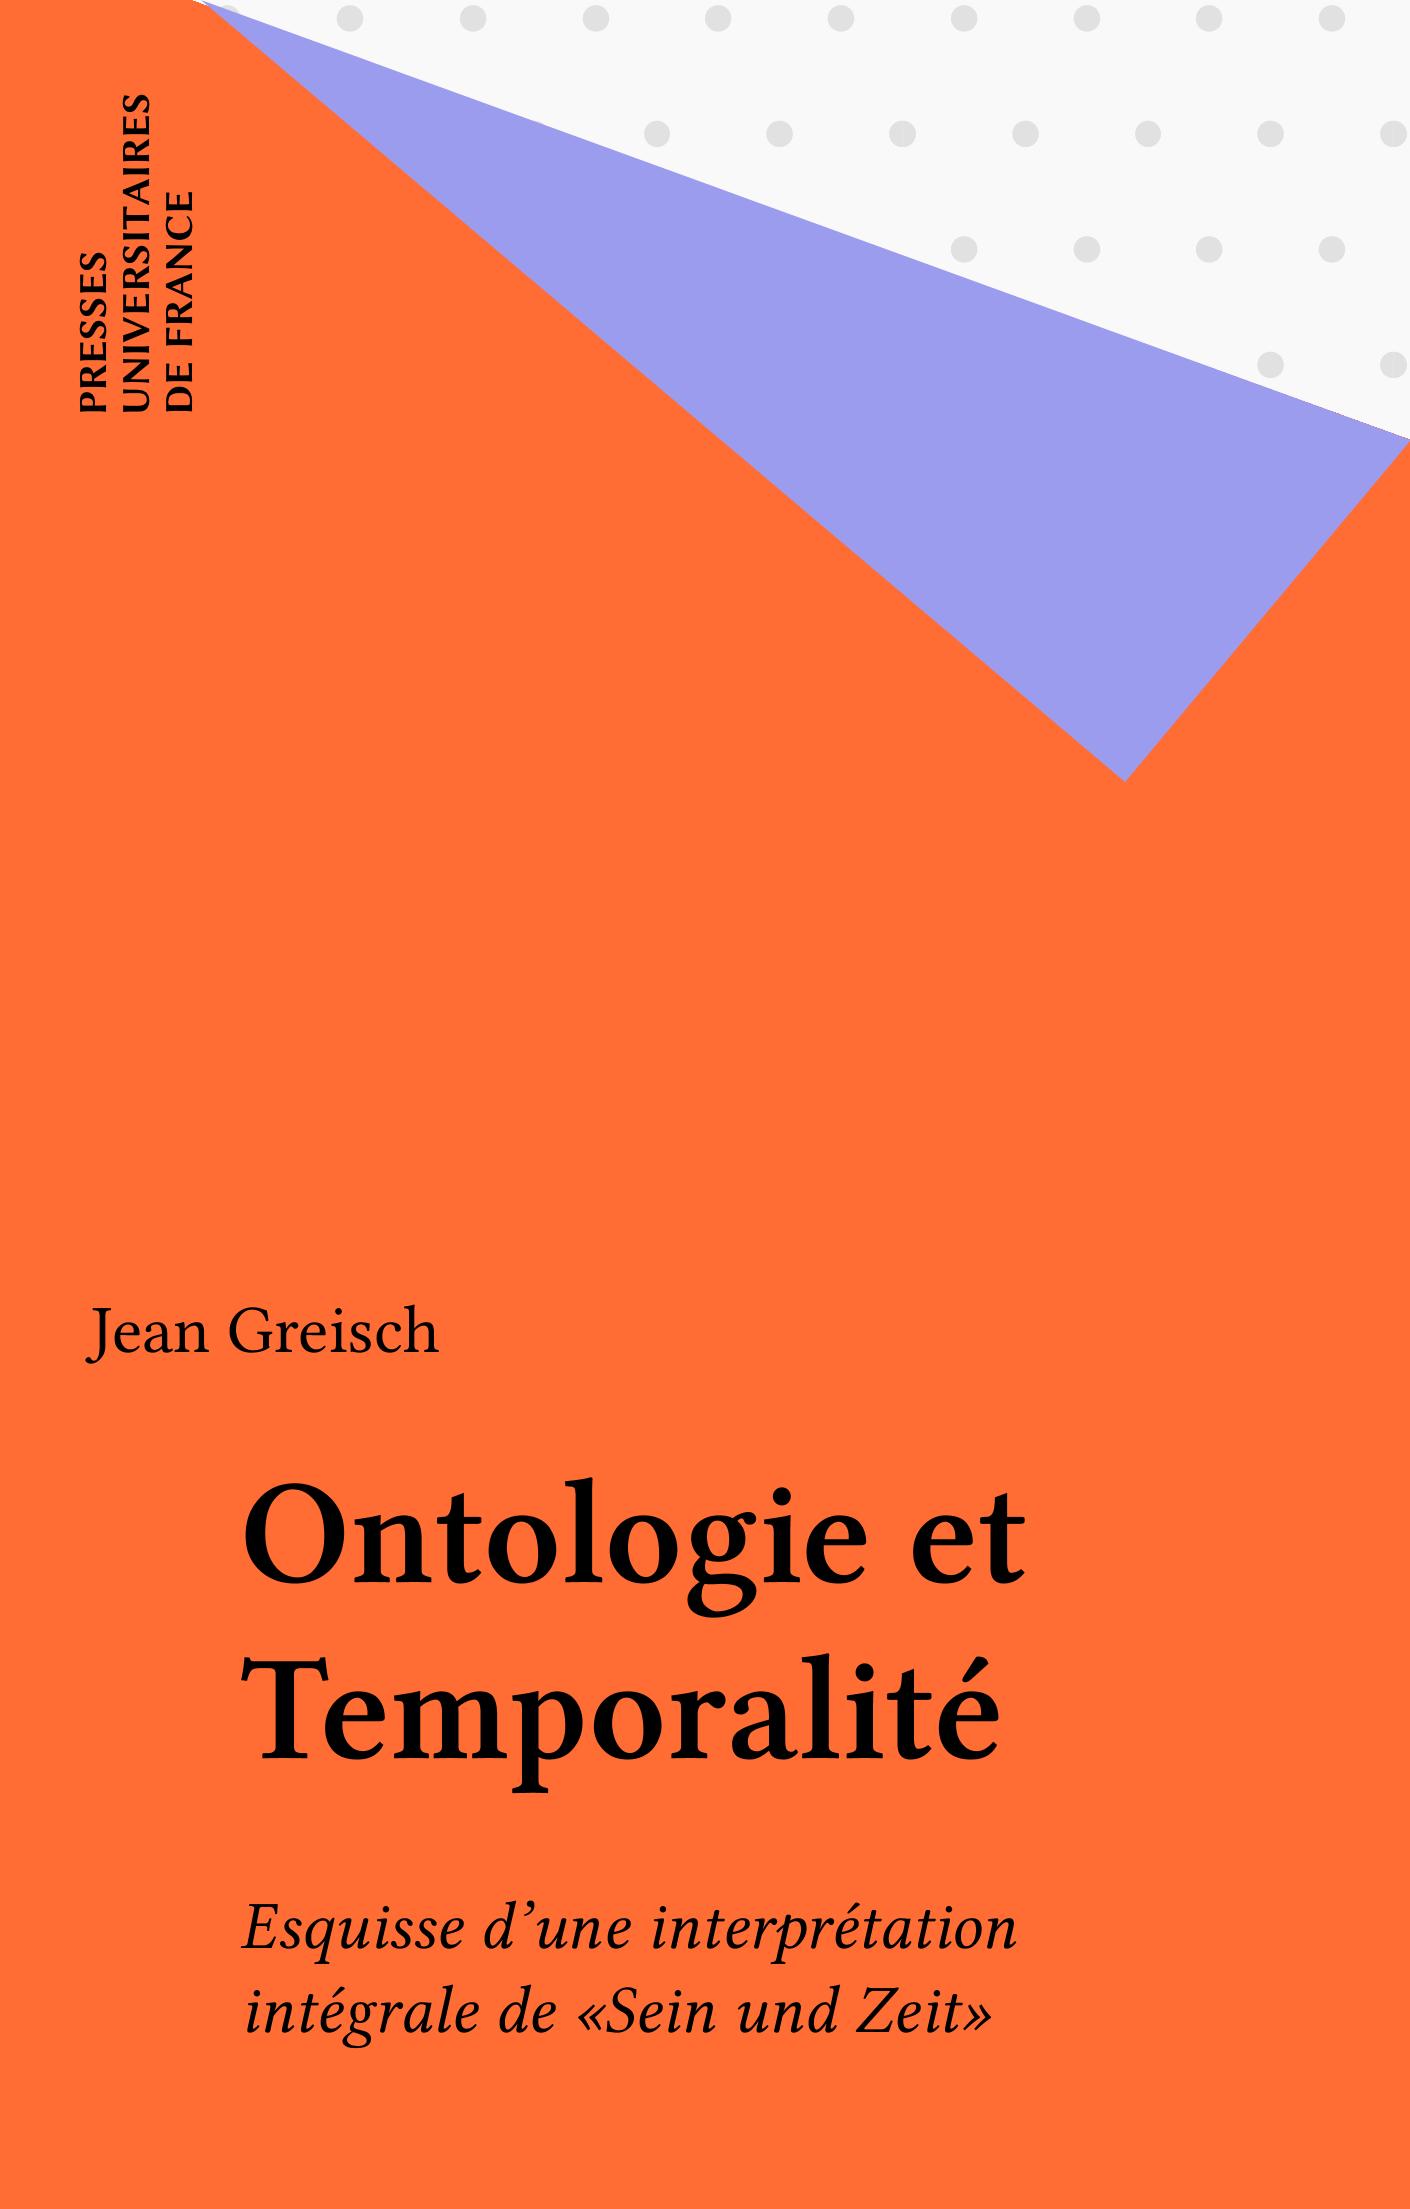 Ontologie et Temporalit?